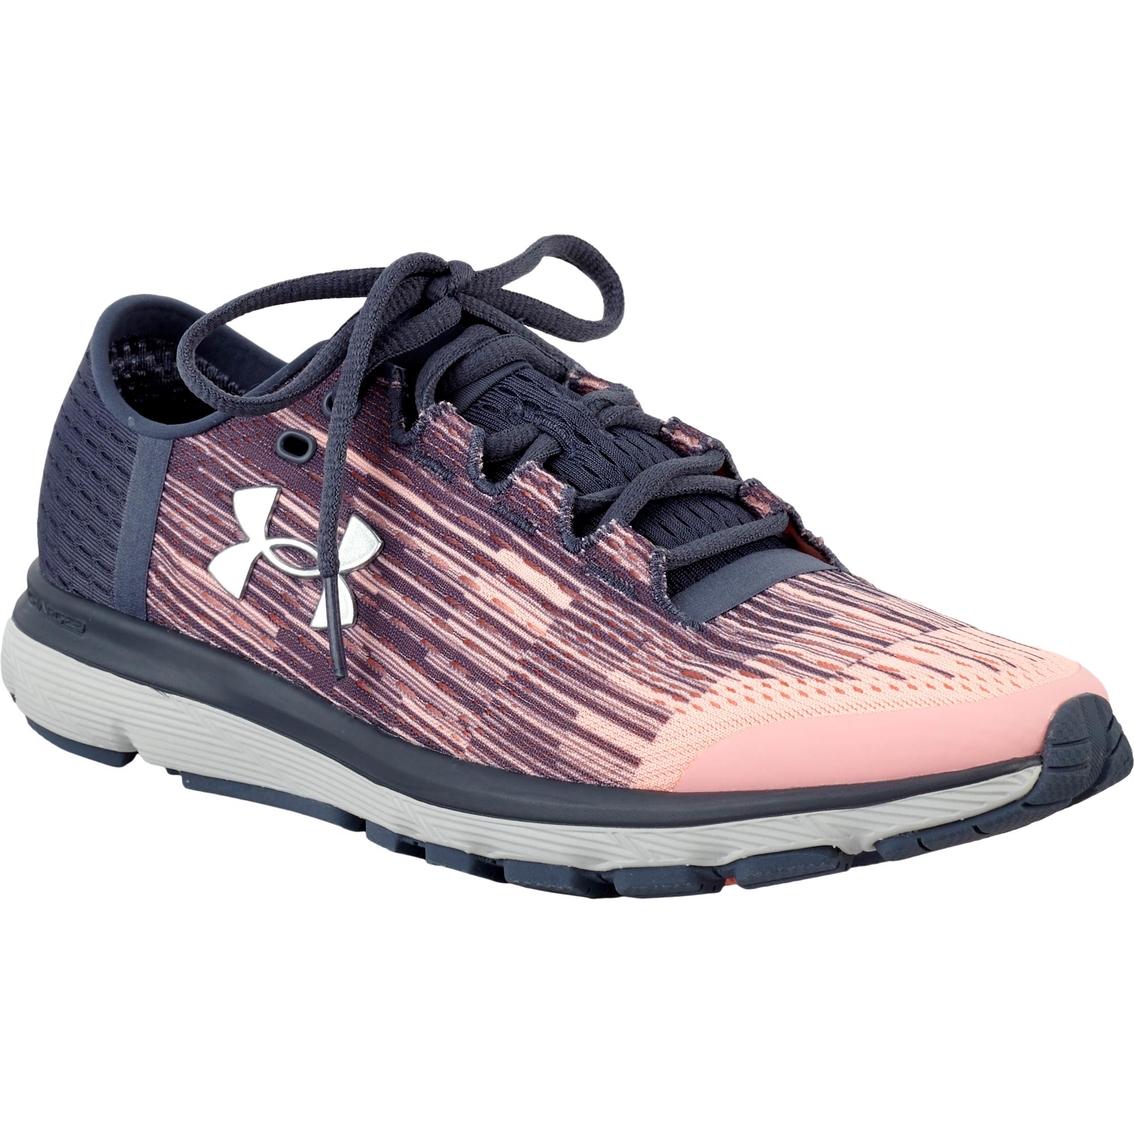 Under Armour Women s Speedform Velociti Gr Athletic Shoes  30cb671b1a